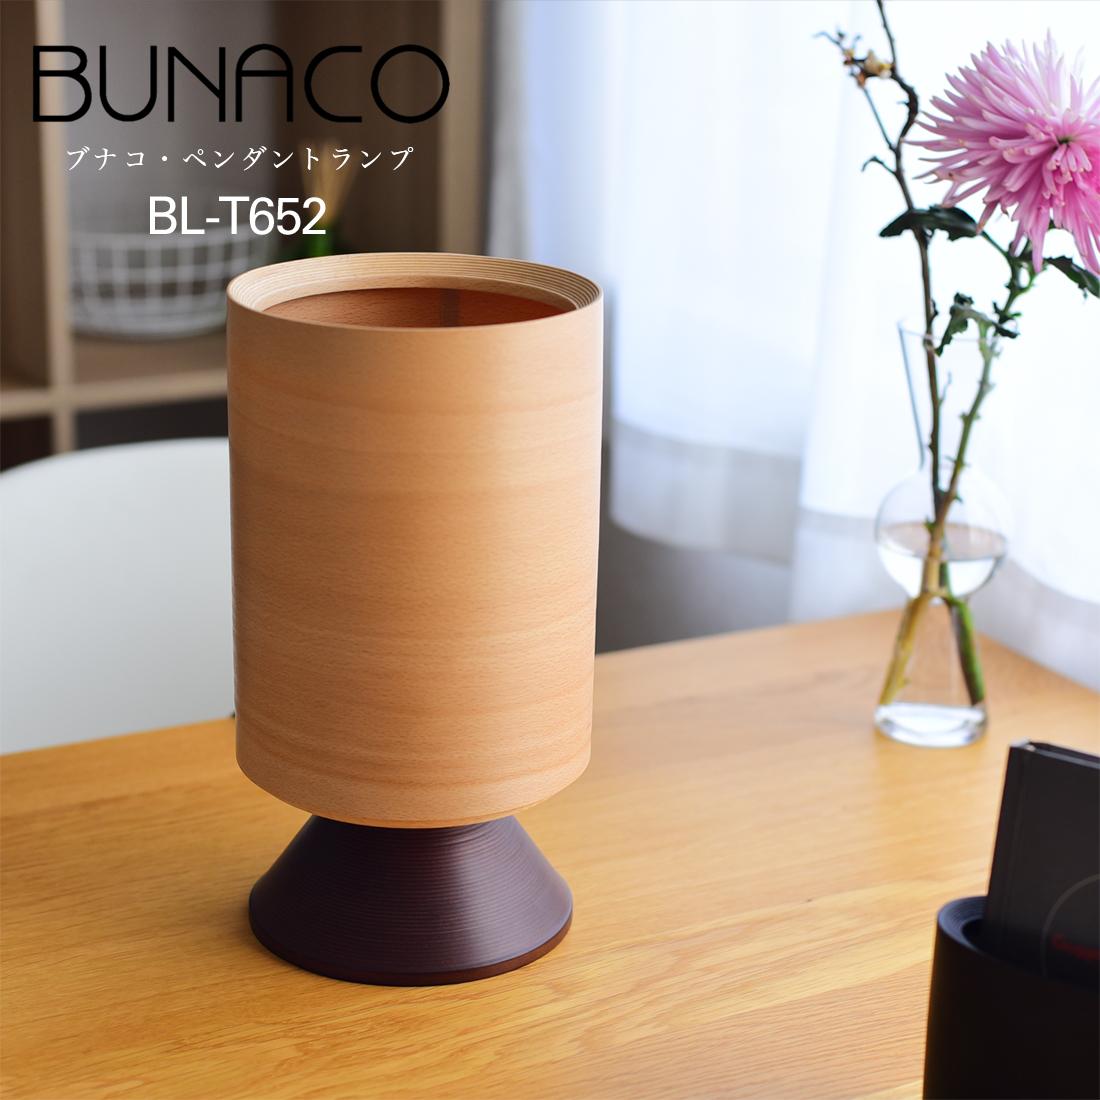 【BUNACO/ブナコ】ブナコのテーブルランプ照明 Table BUNACO Lamp Table BUNACO Lamp BL-T652, Deal:7656bcf6 --- sunward.msk.ru